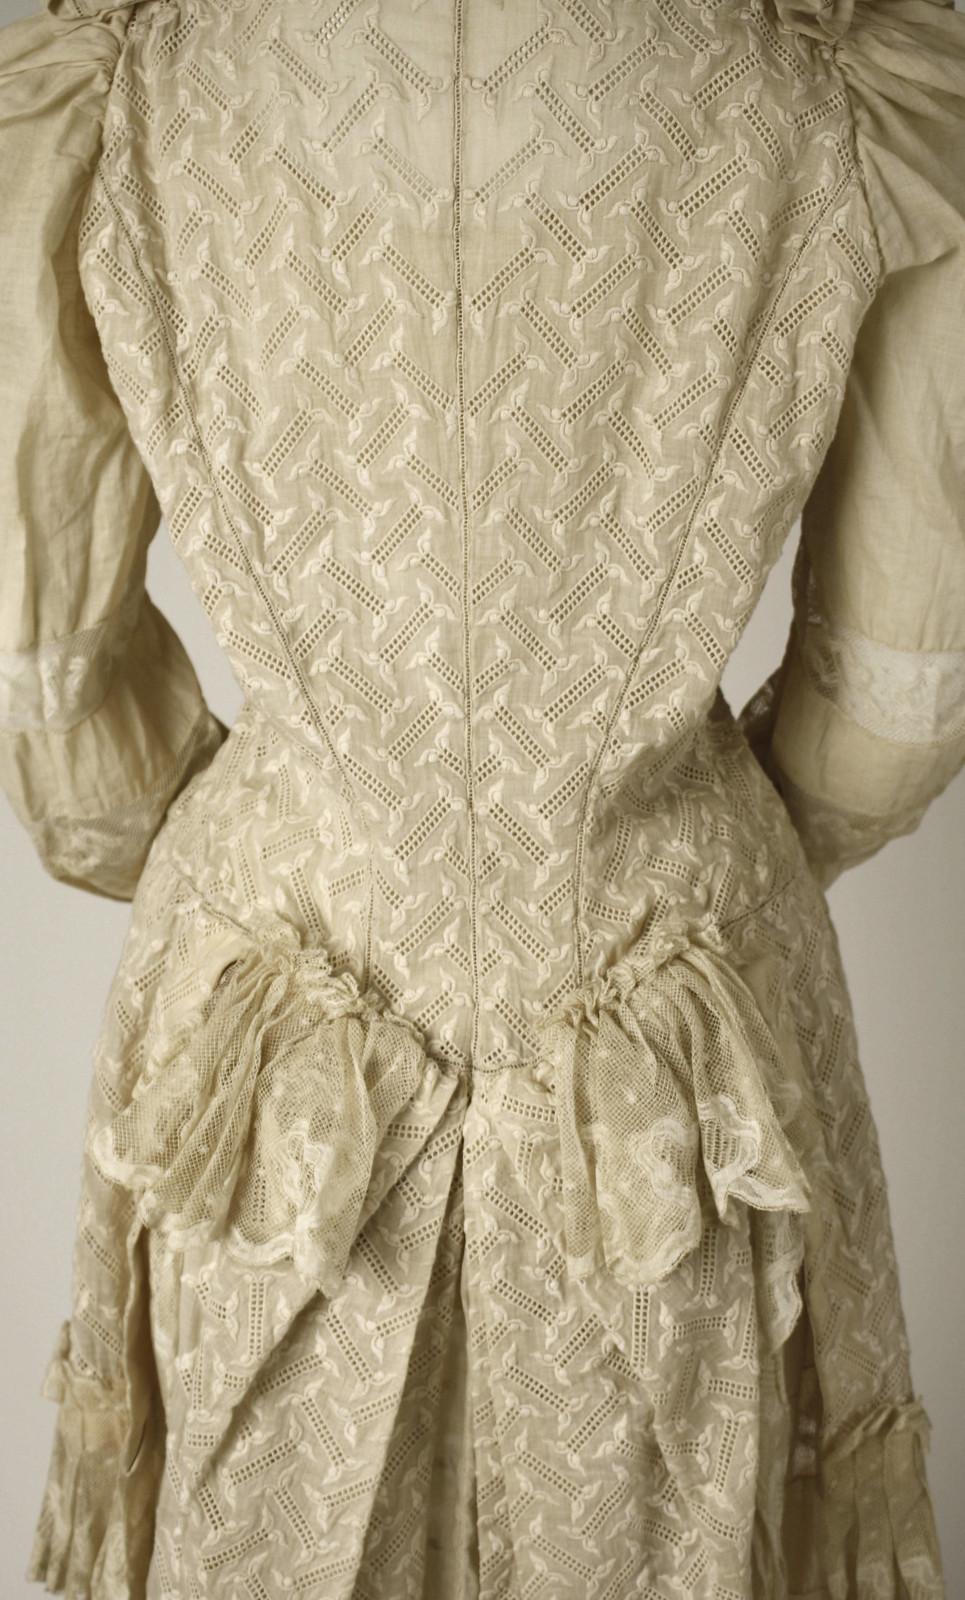 c1891. American. Cotton. metmuseum